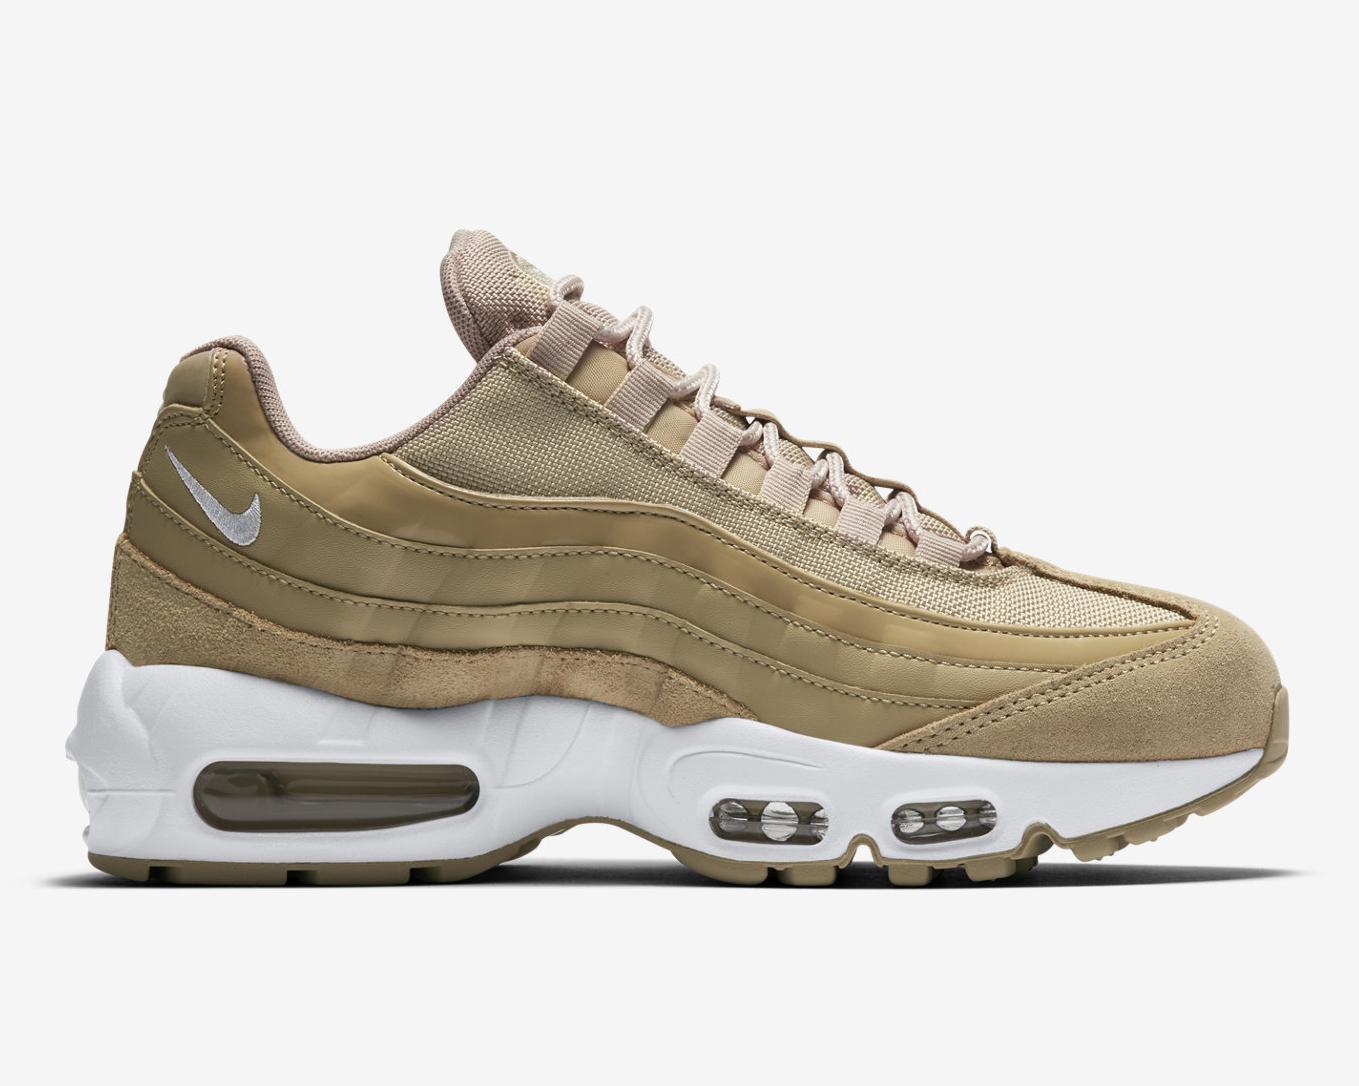 Kovimmat sneaker-trendit vuonna 2018 - The Athlete s Foot eb2baf2351